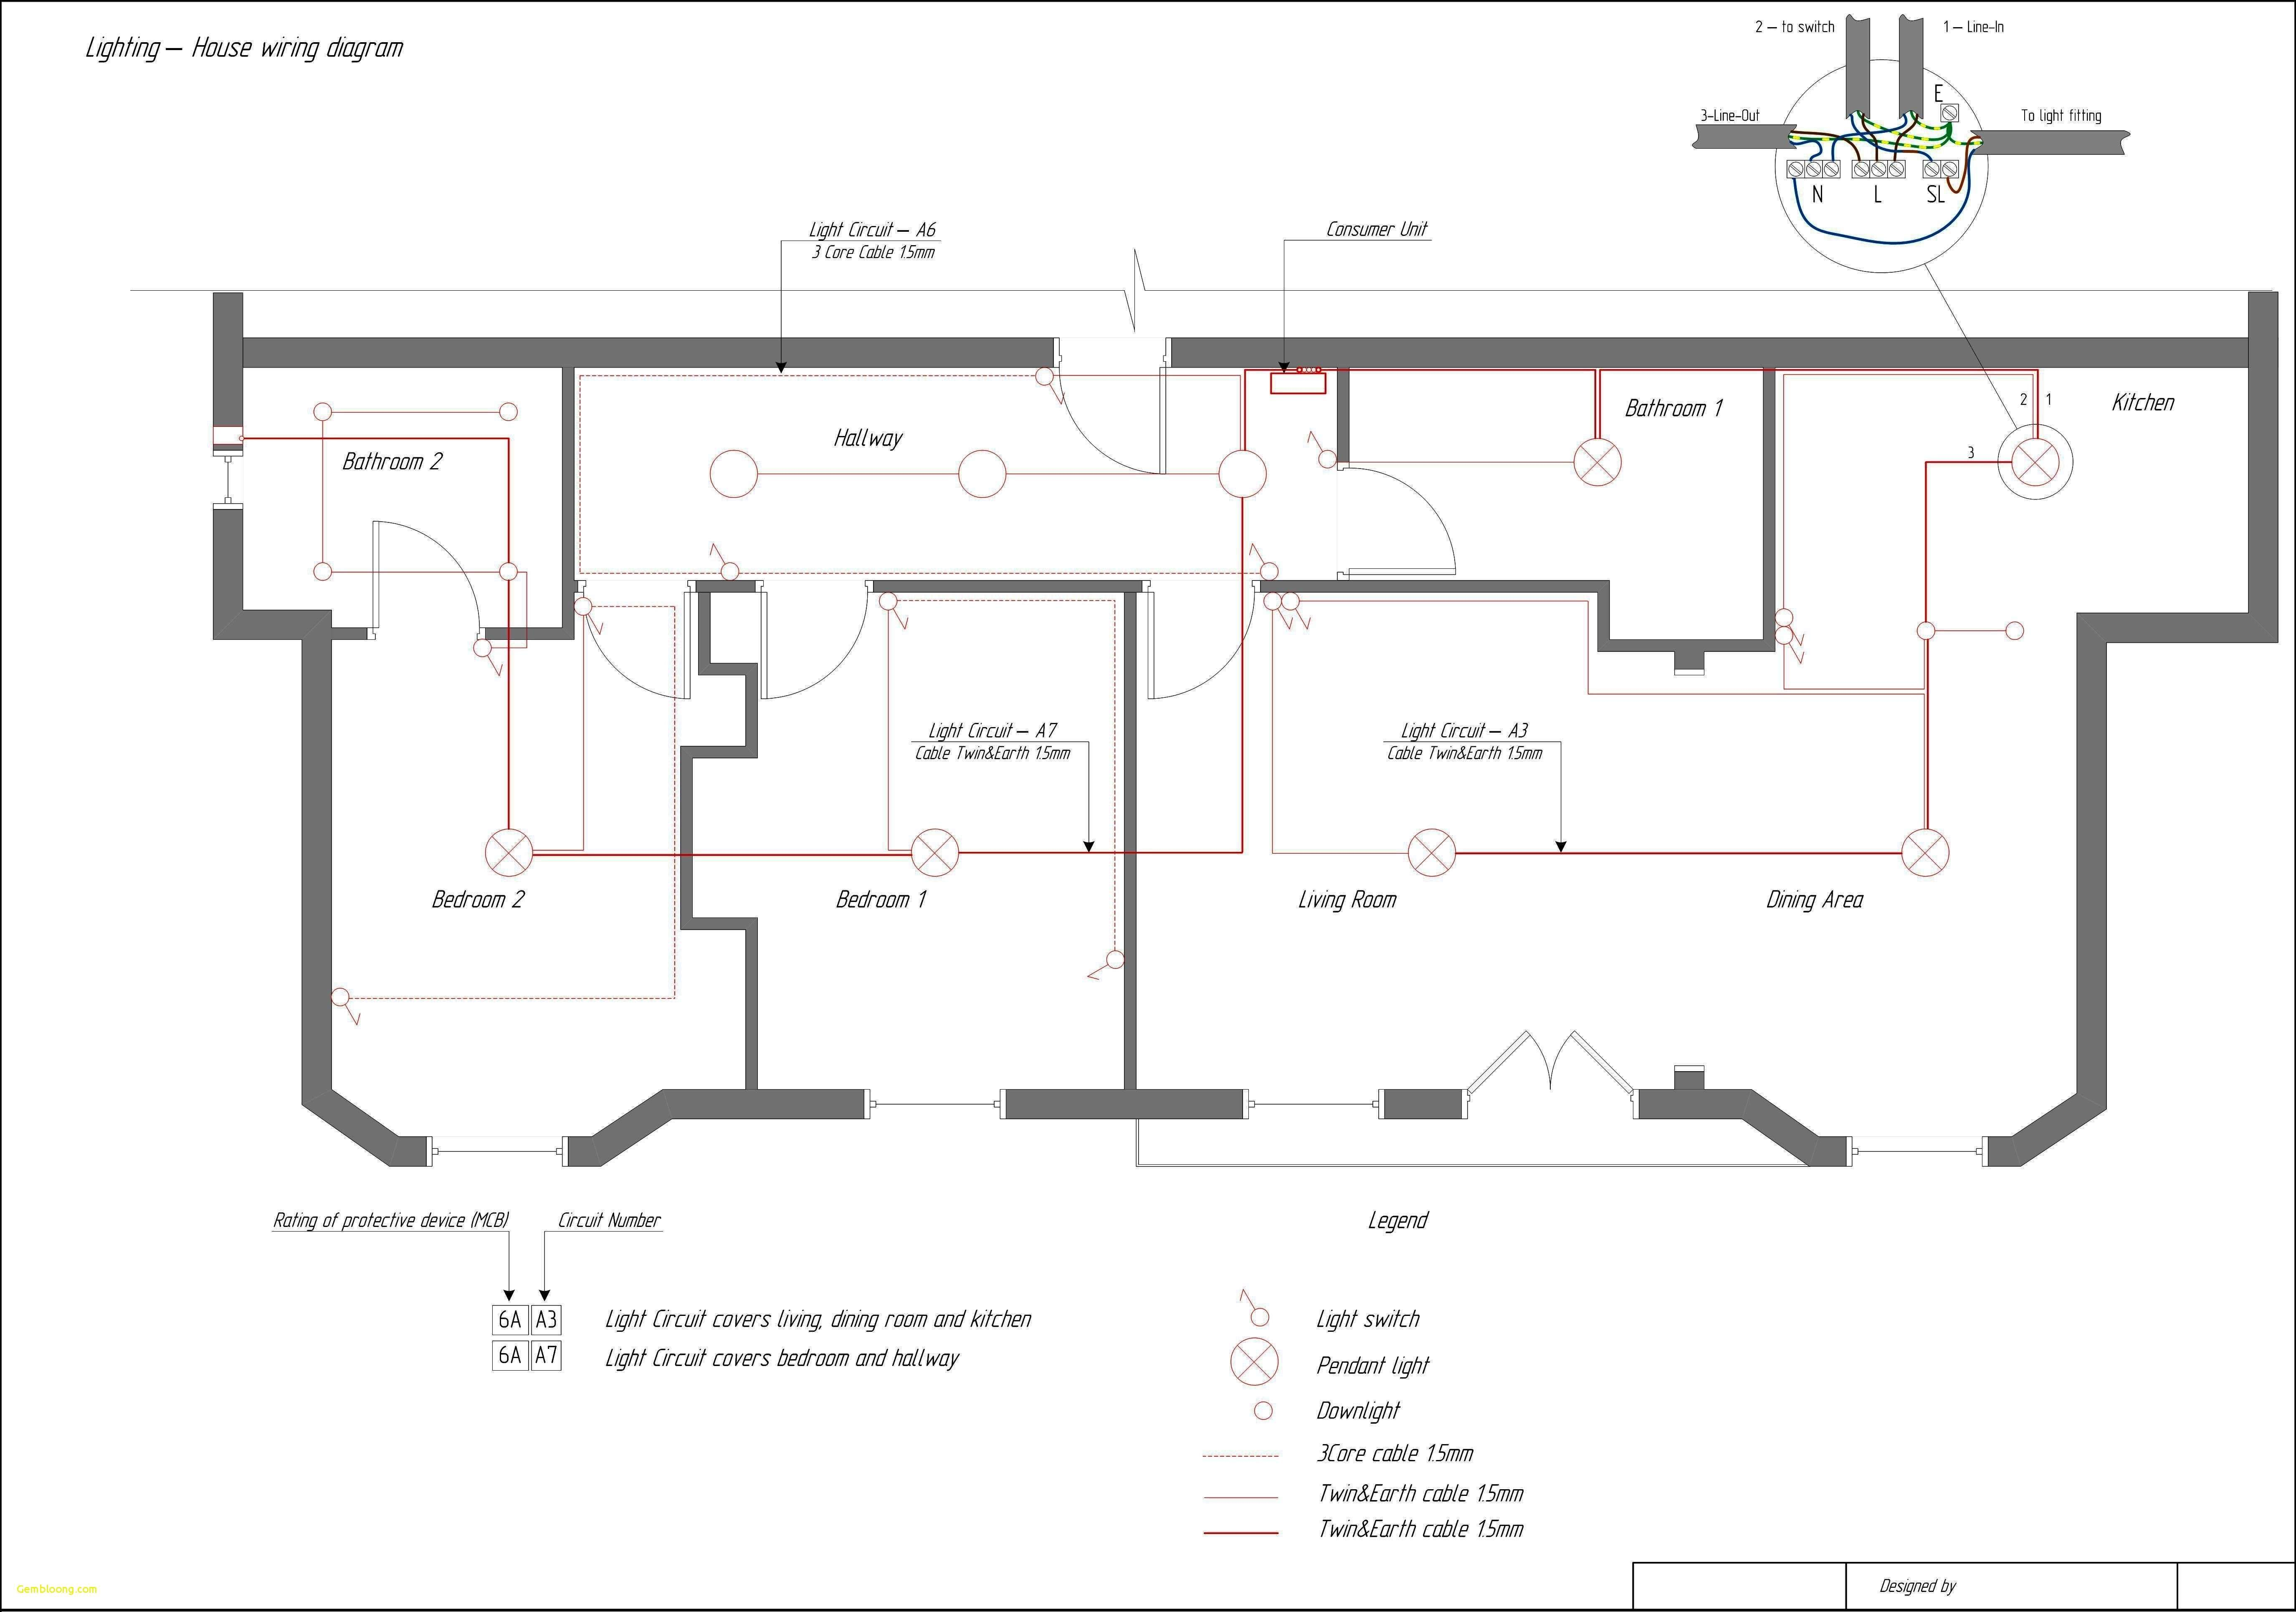 wiring diagram bathroom lovely wiring diagram bathroom bathroom fan light wiring diagram mikulskilawoffices [ 5499 x 3860 Pixel ]